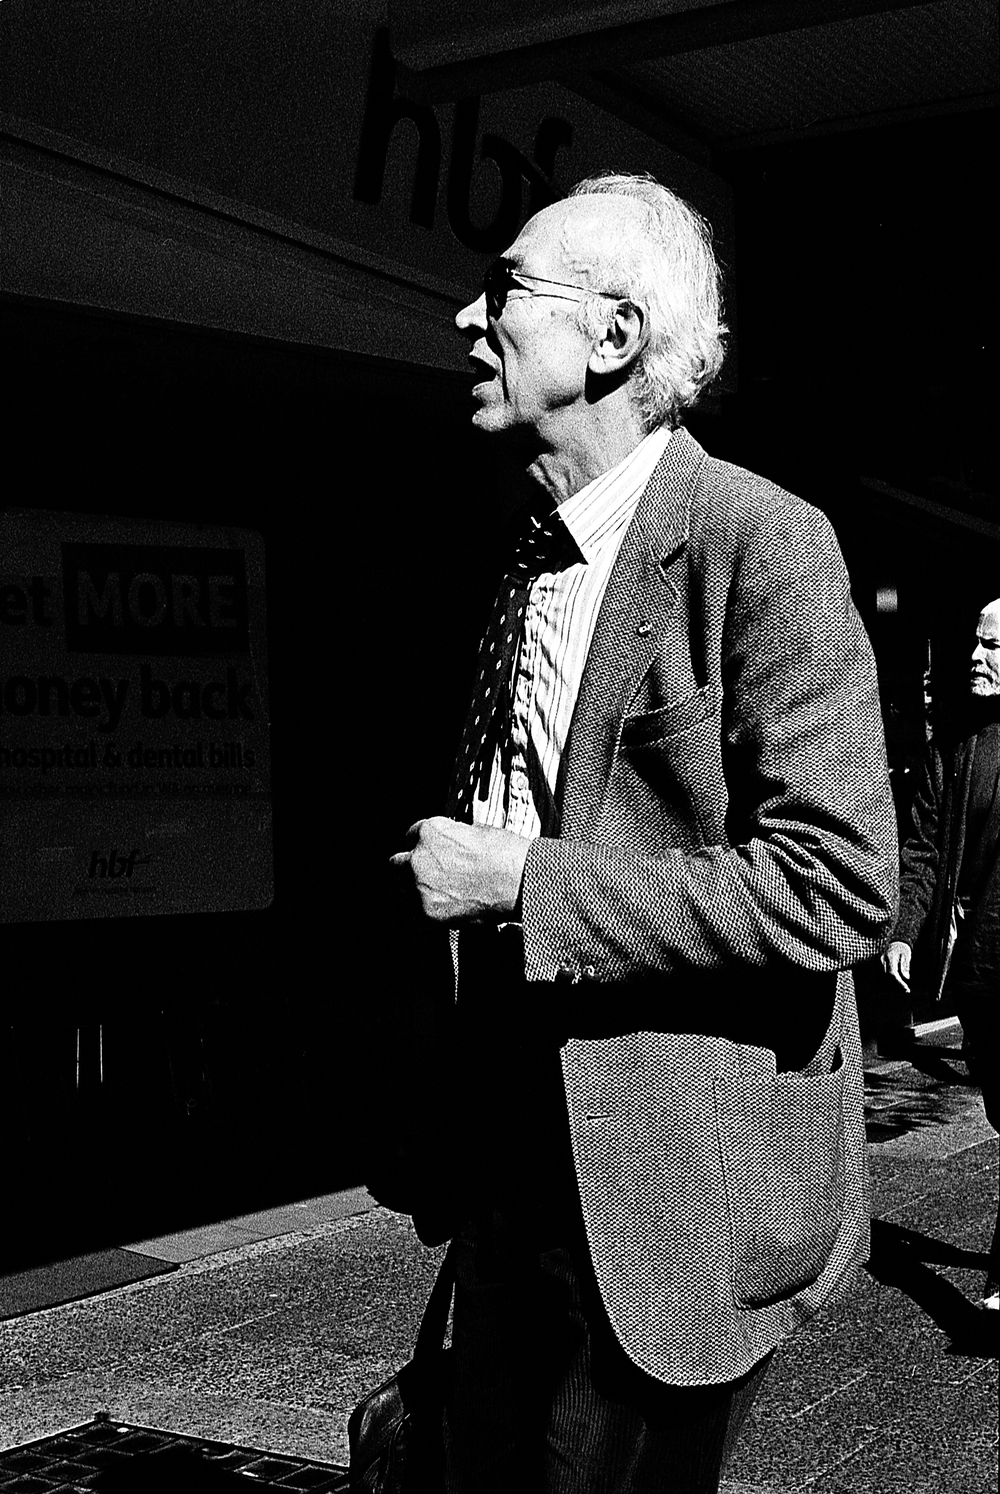 perth street man.jpg